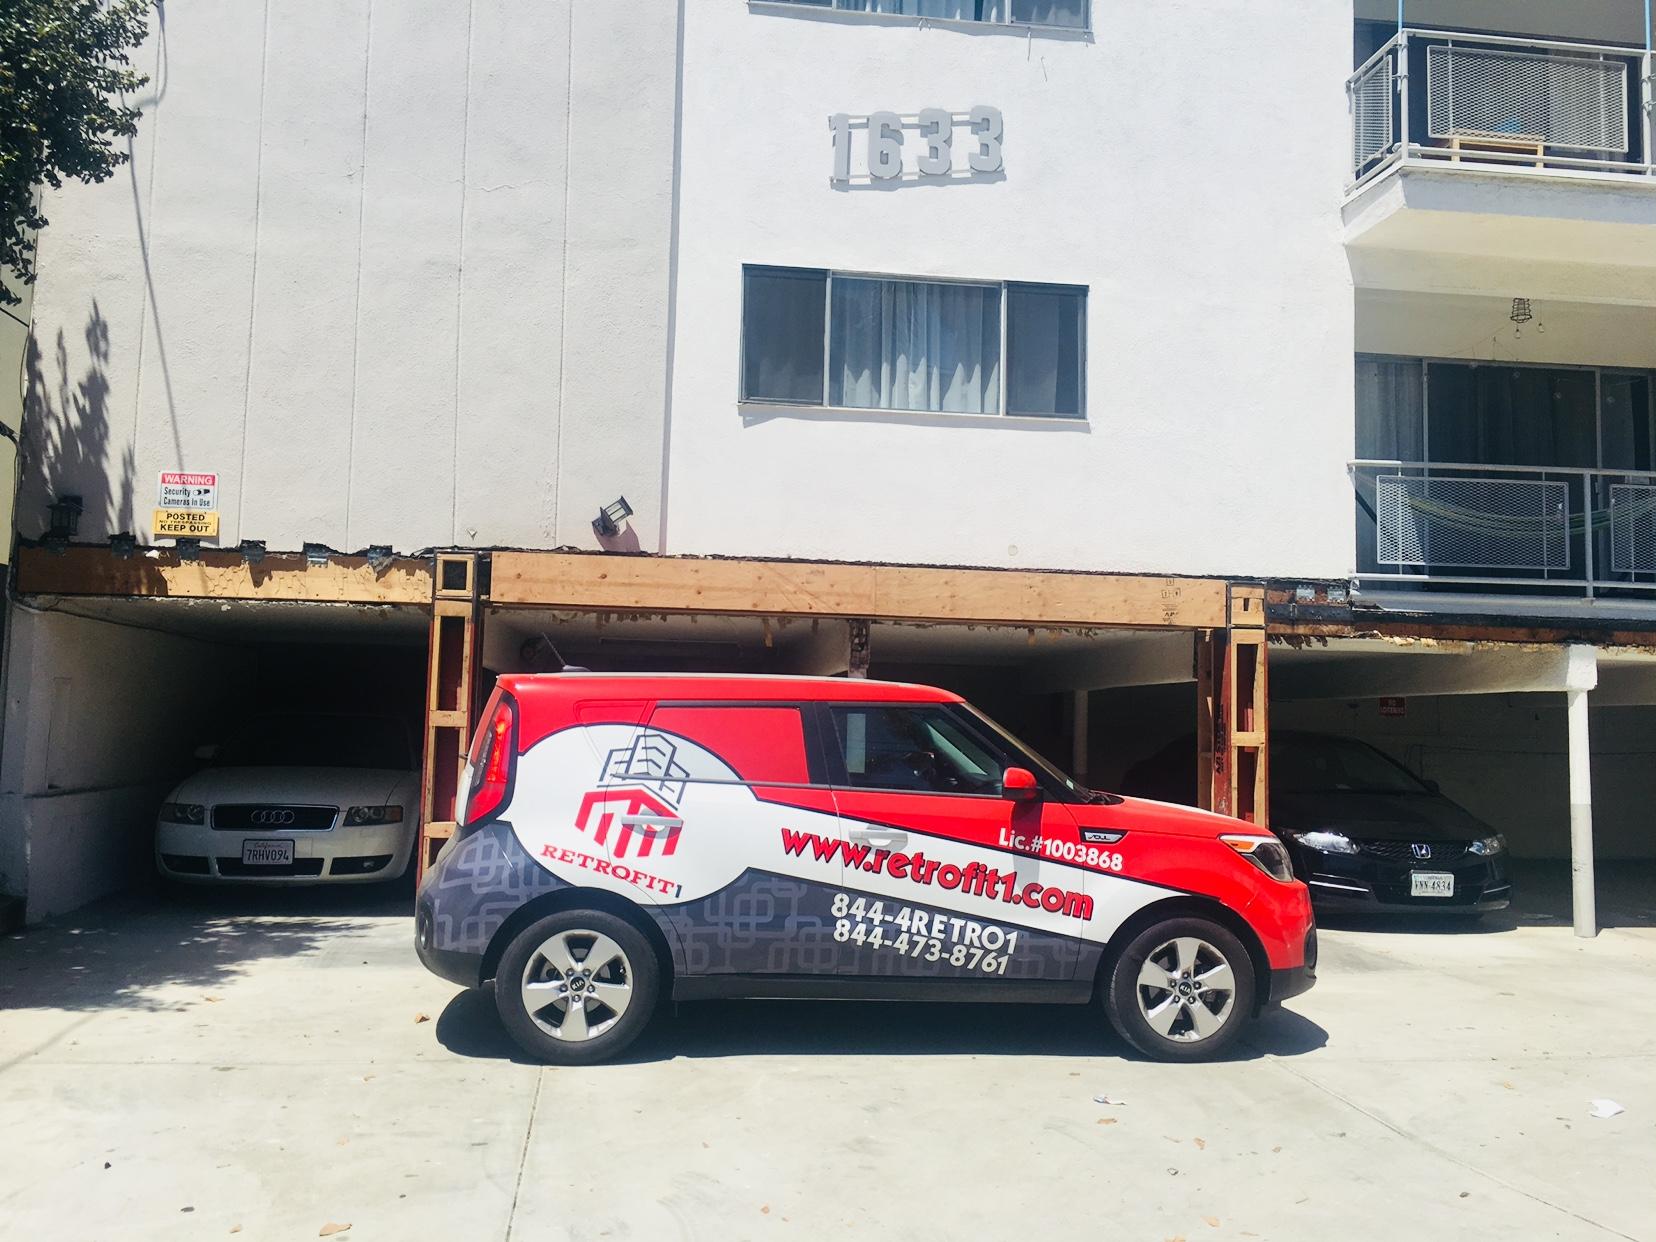 Retrofit1 - Soft Story Retrofitting contractor in Los Angeles.